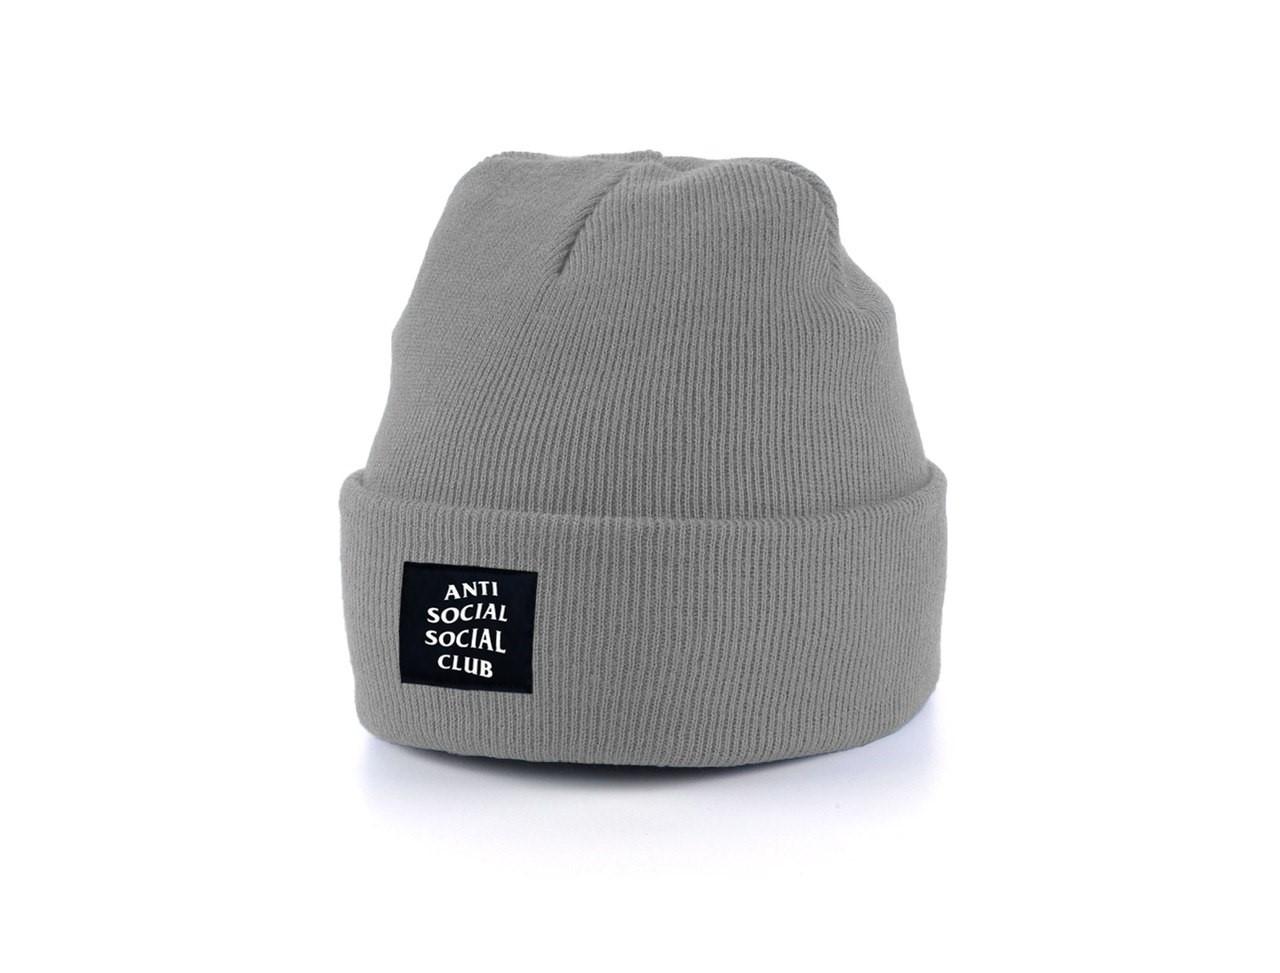 Мужская теплая шапка Anti Social Social Club универсальный размер